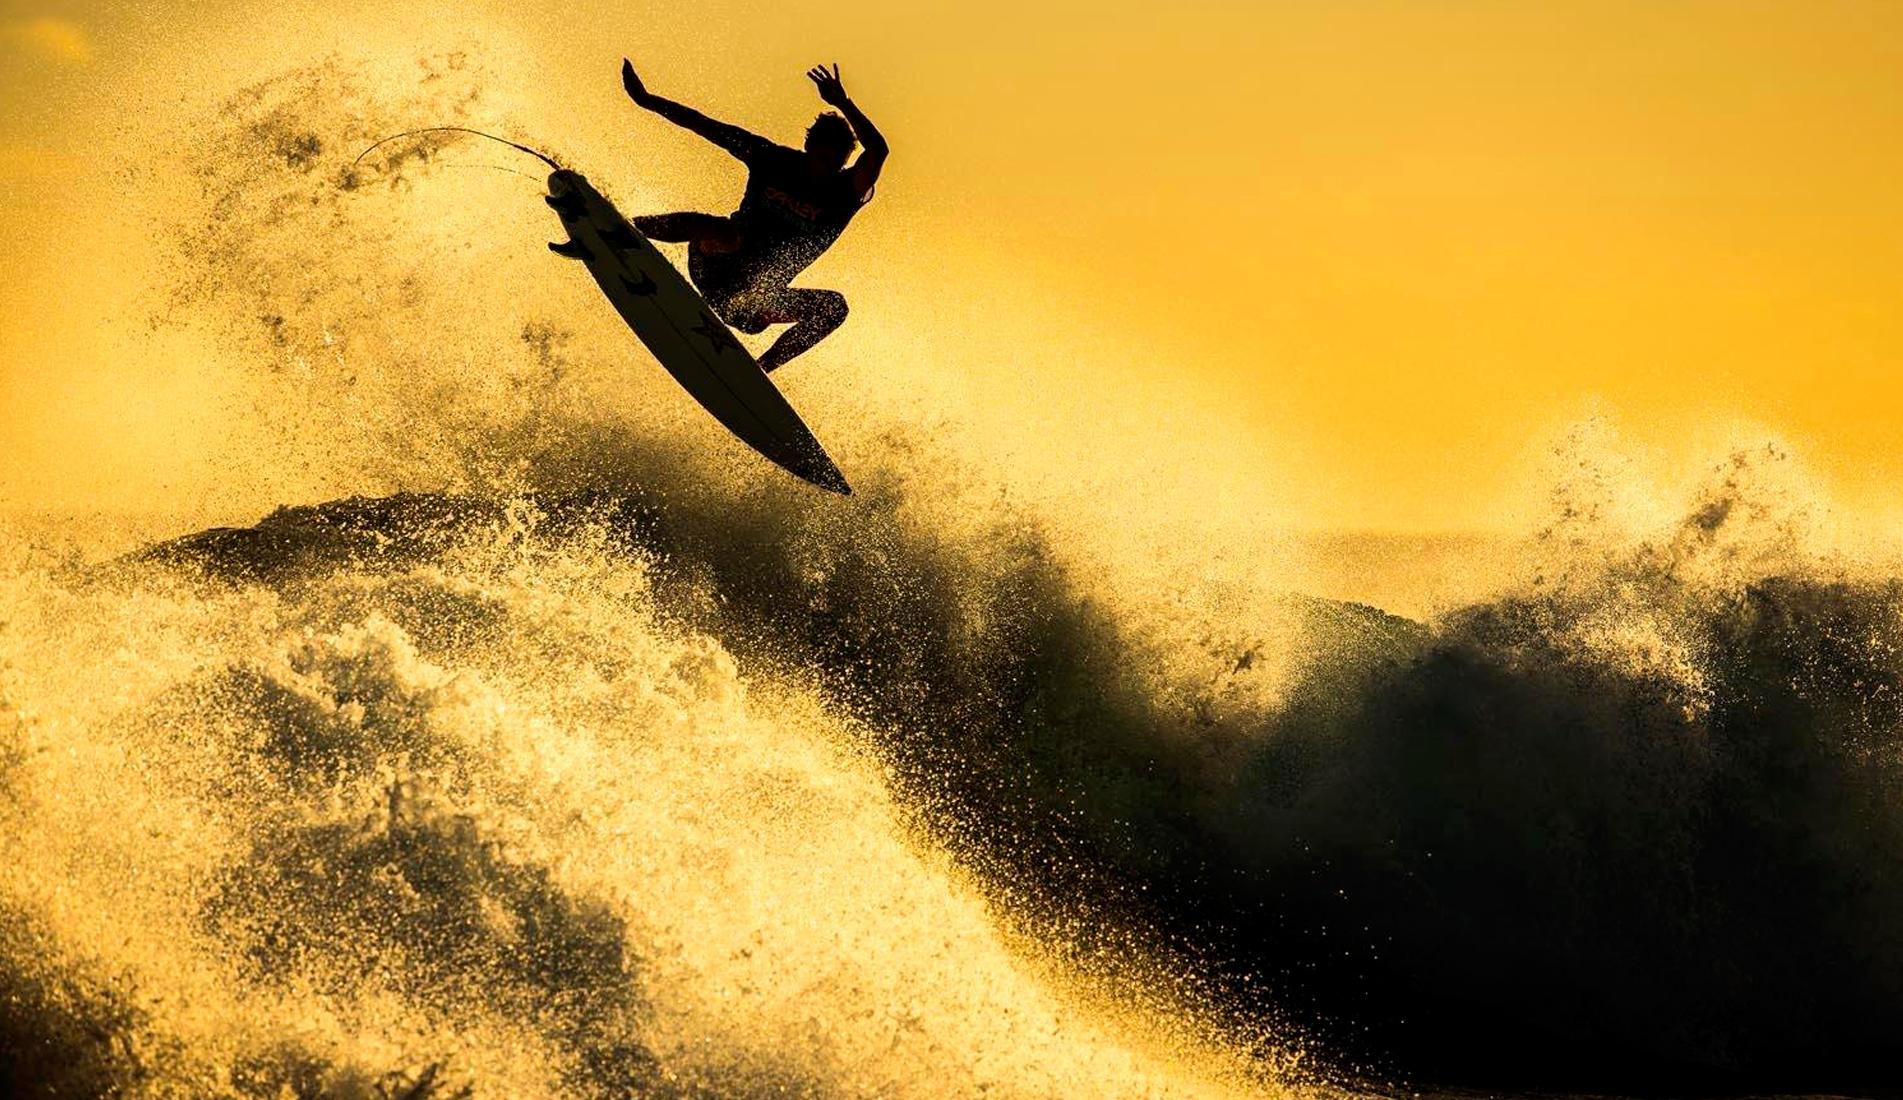 fotos-adrenalina-watersports-19